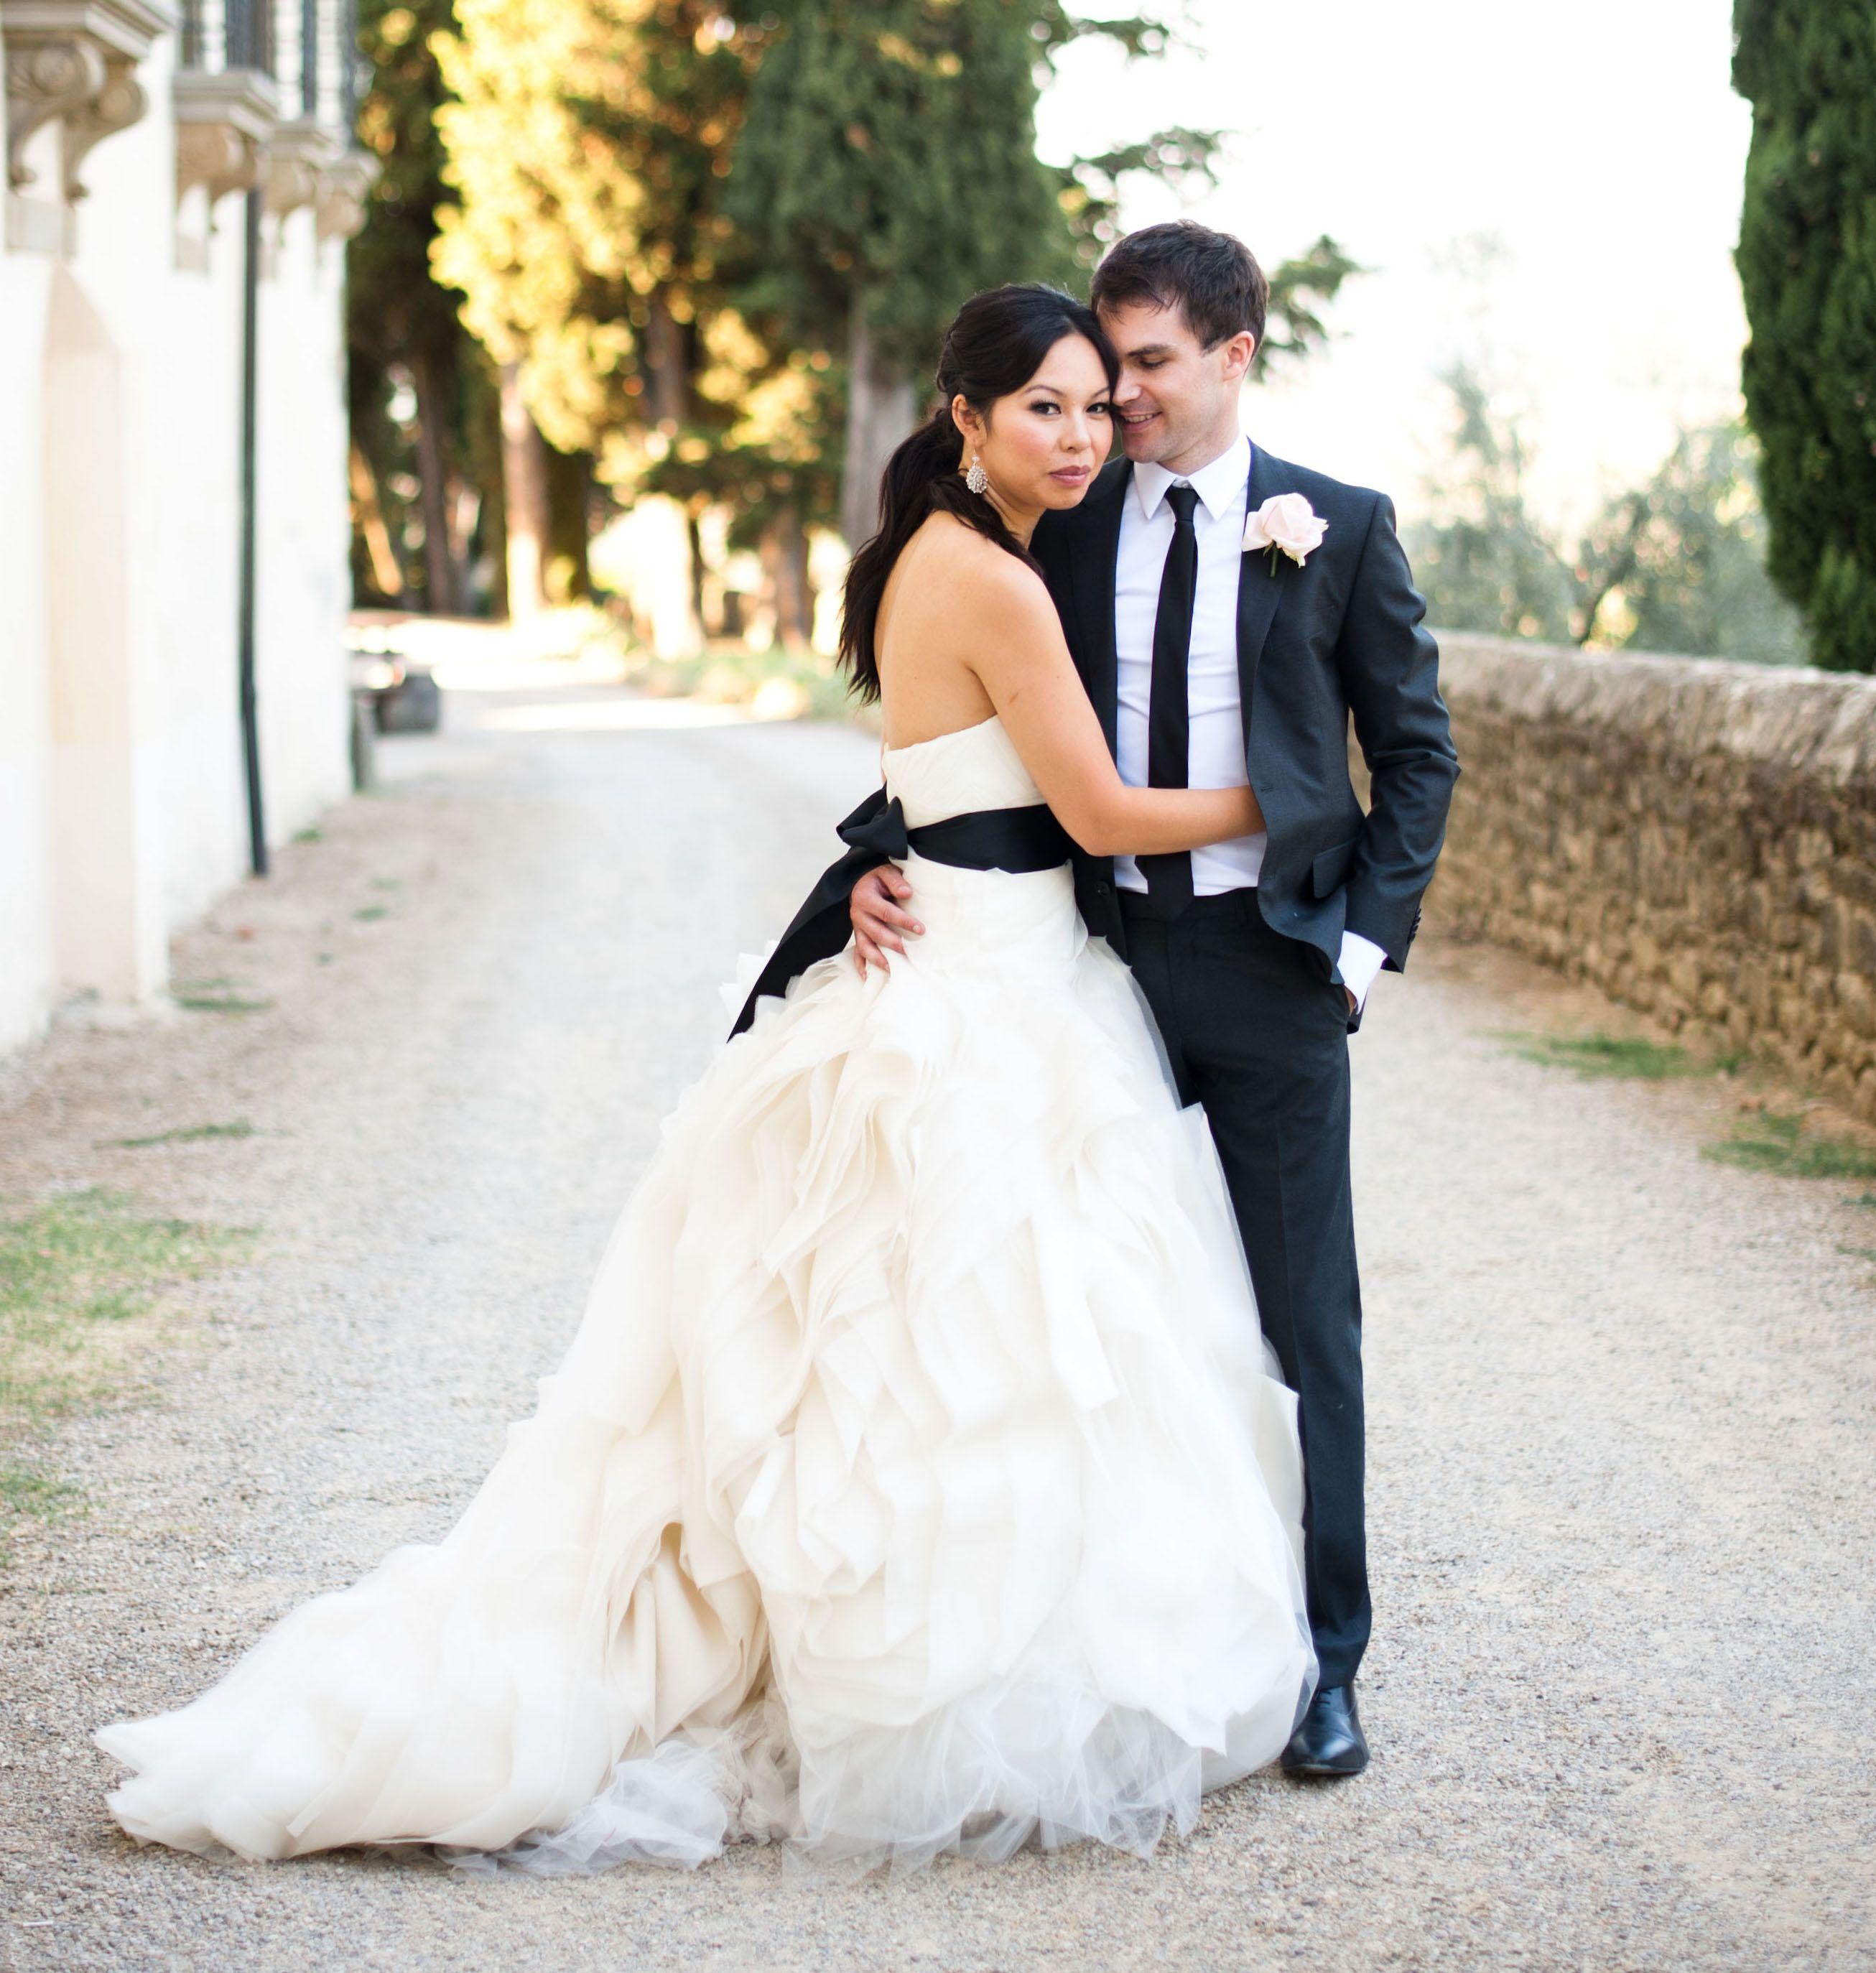 Real weddings joanne fashion design pinterest fashion real weddings joanne junglespirit Images